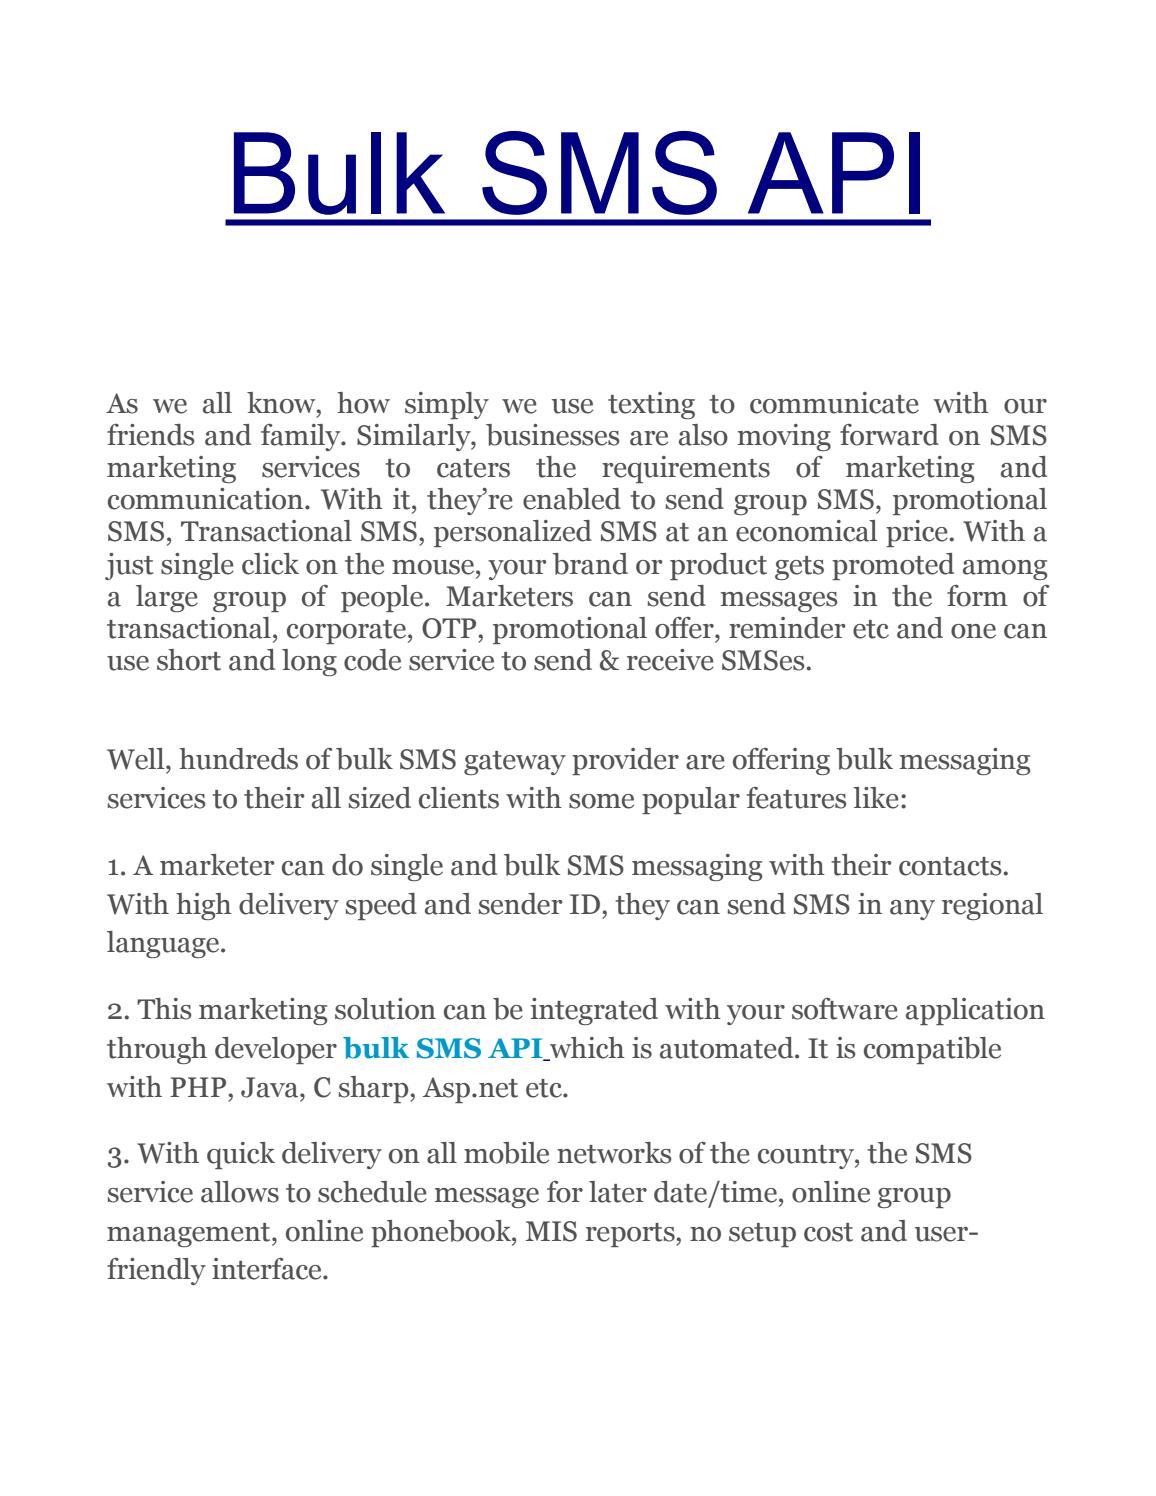 SMS σε απευθείας σύνδεση dating δωρεάν ιστοσελίδες γνωριμιών στο σουίπιτς Σάφολκ